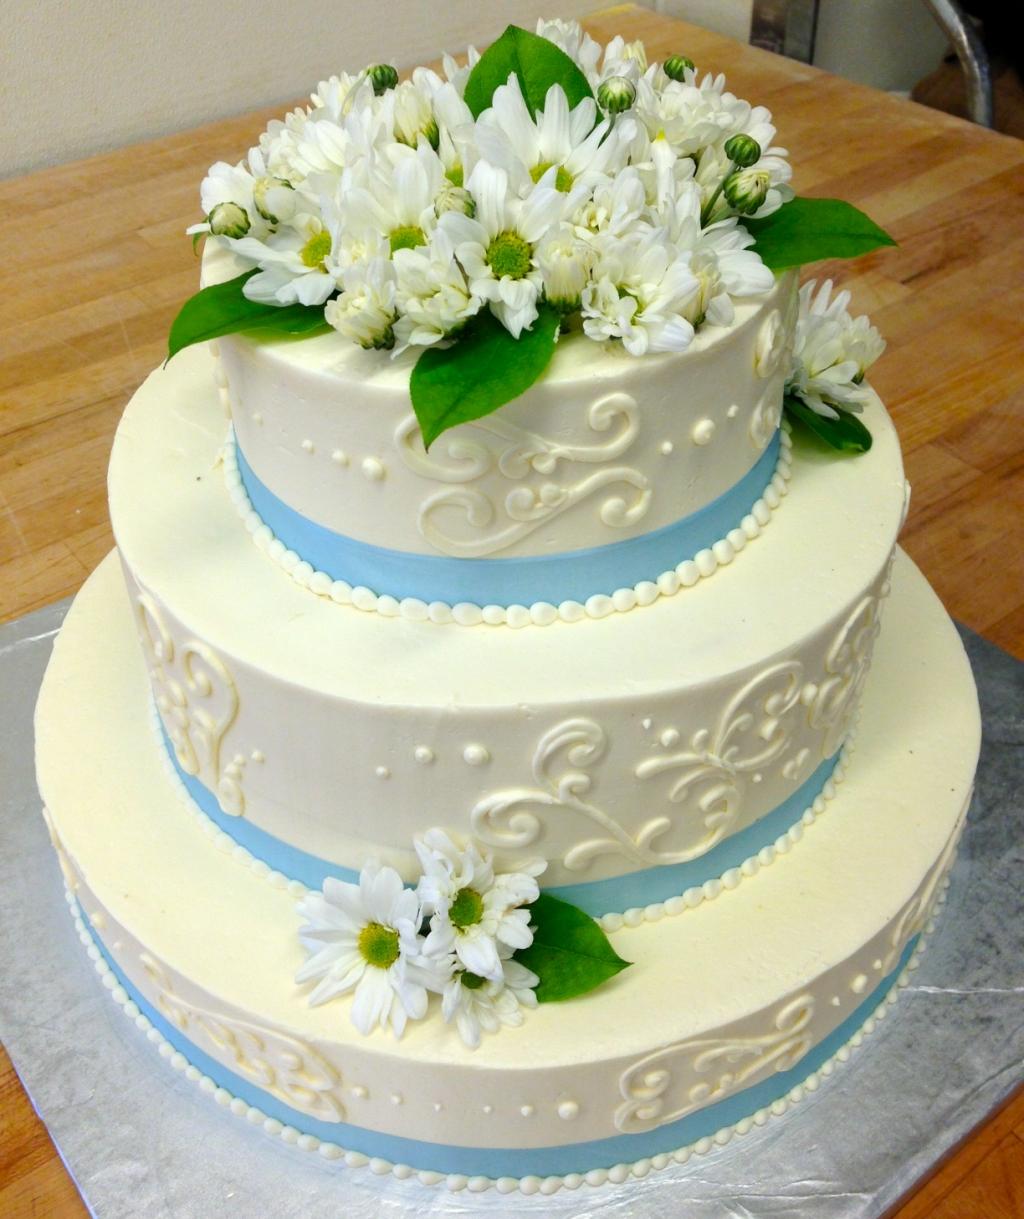 Ithaca Bakery Cakes